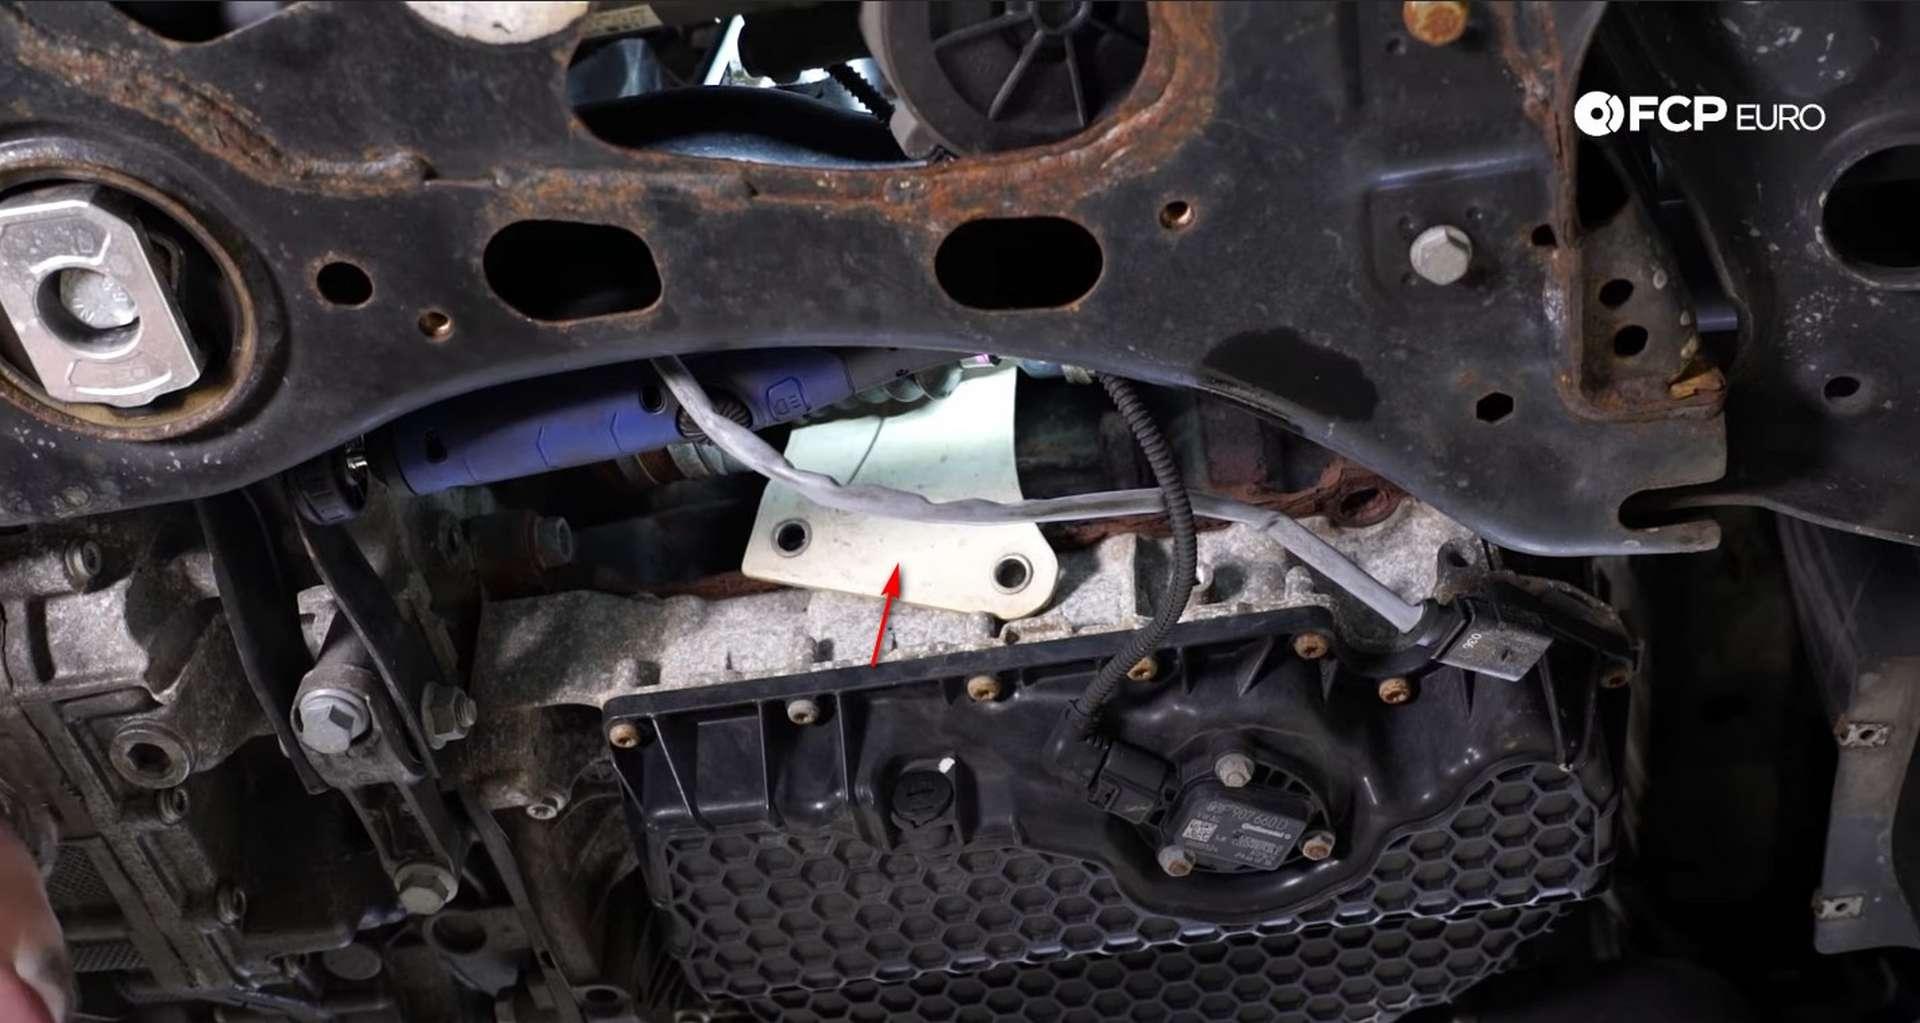 DIY MK7 VW GTI Turbocharger Upgrade the axle's heat shield